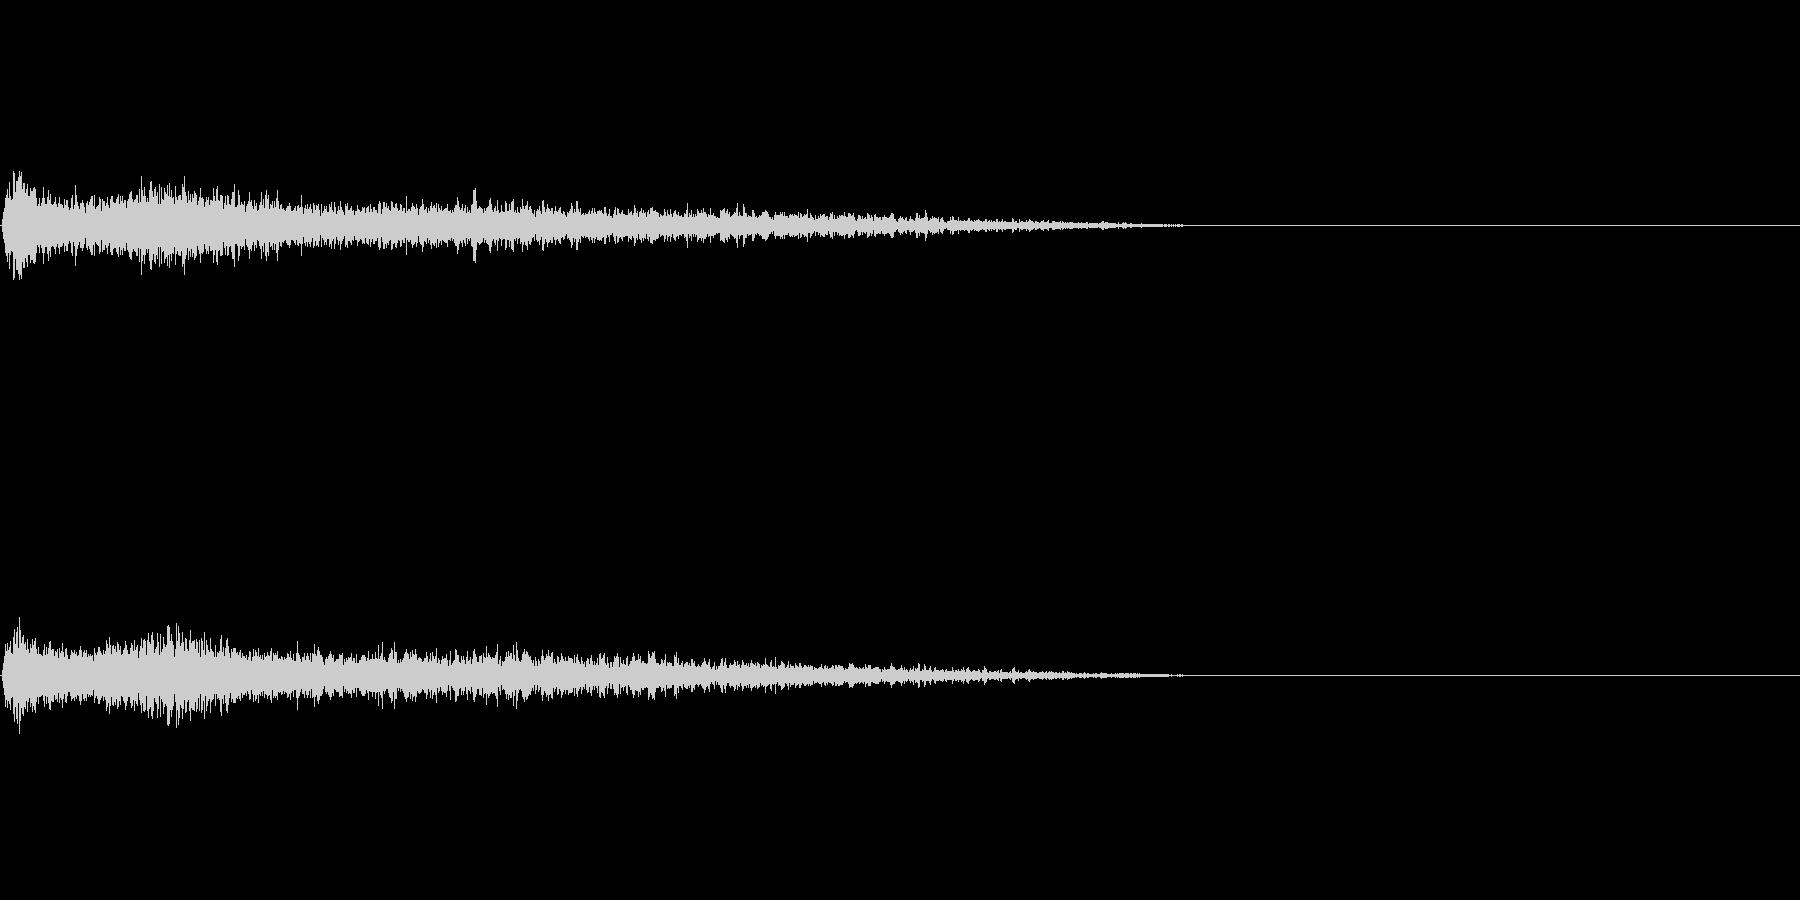 Dメジャー インパクト音 衝撃音の未再生の波形